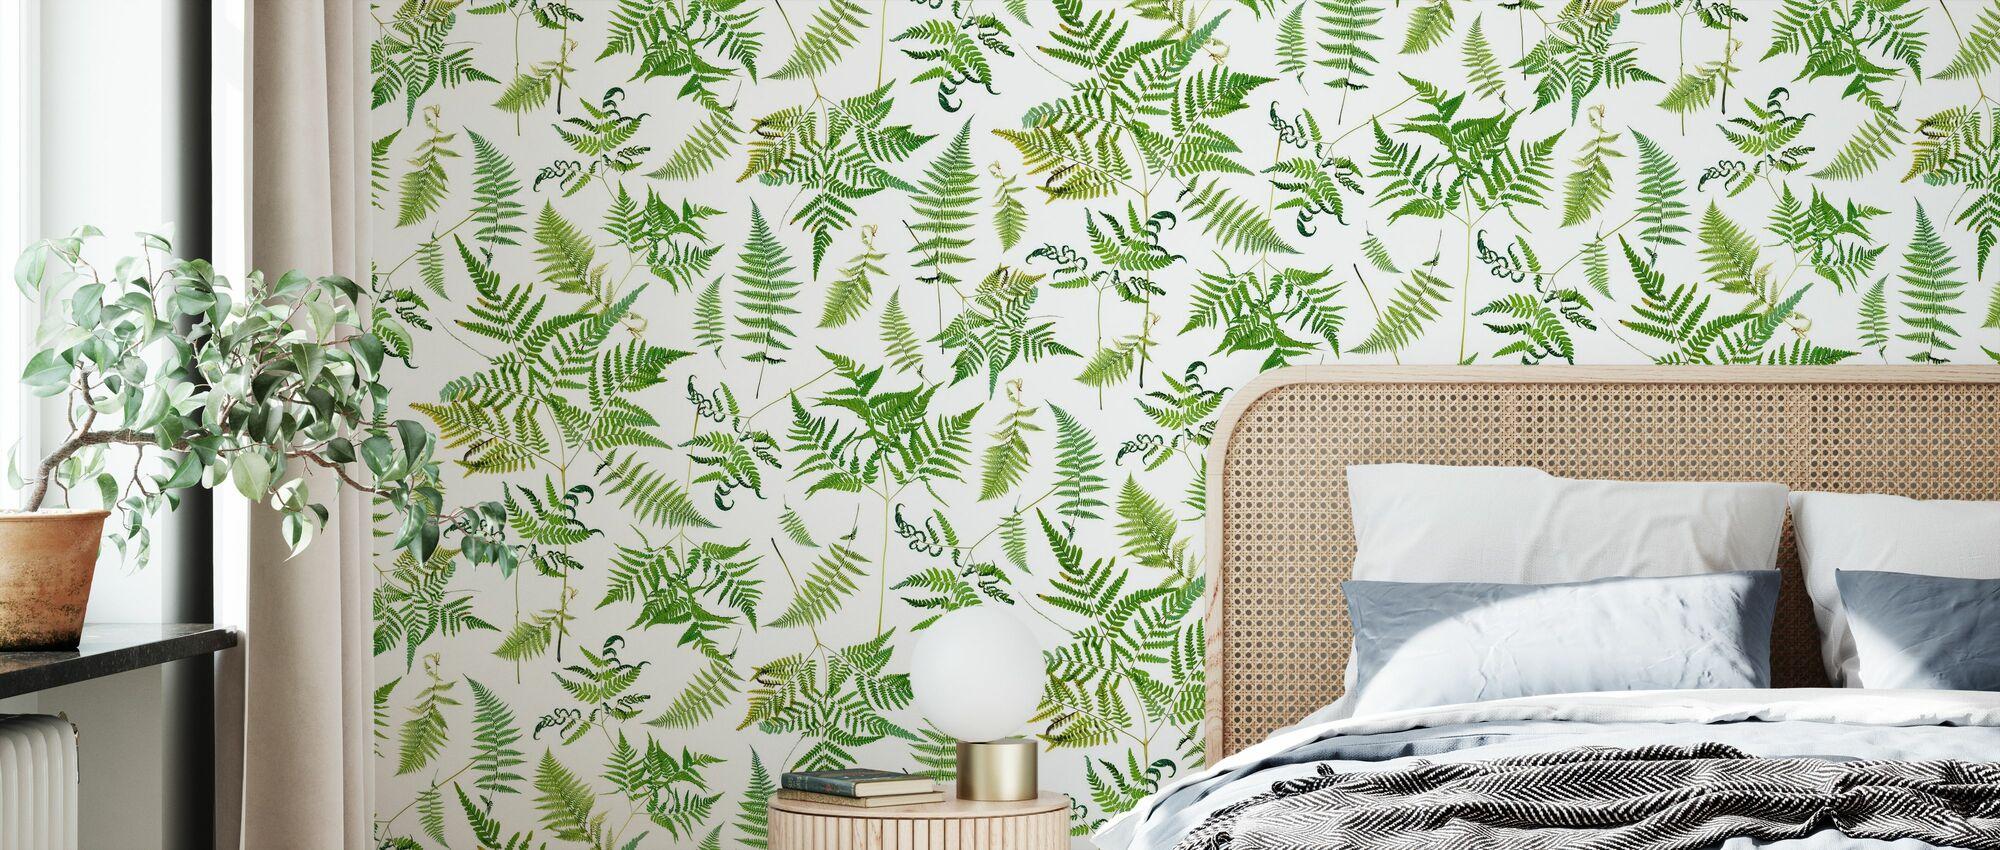 Fern Green - Wallpaper - Bedroom